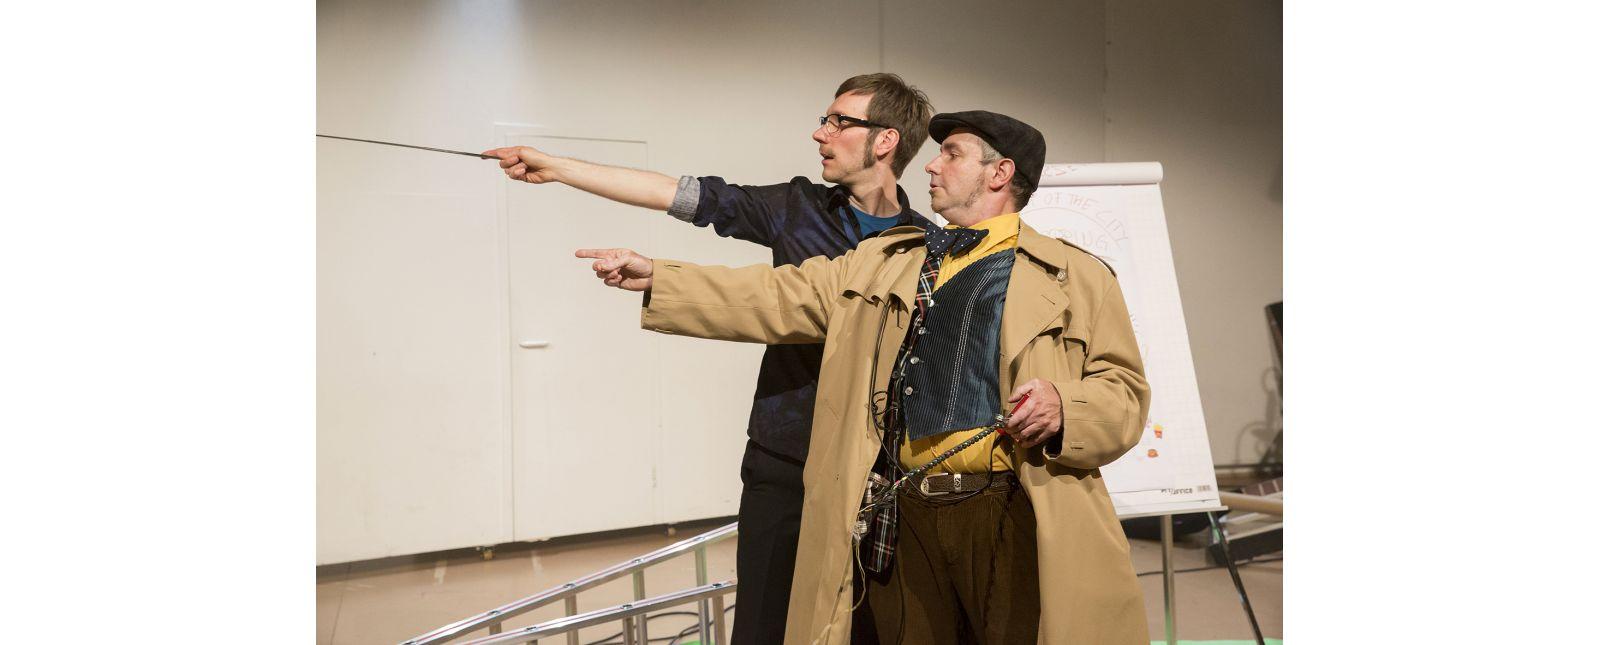 Geisterjagd durchs Theater // Michael Kaiser // Christoph Kopp // 2015 // Rainer Muranyi